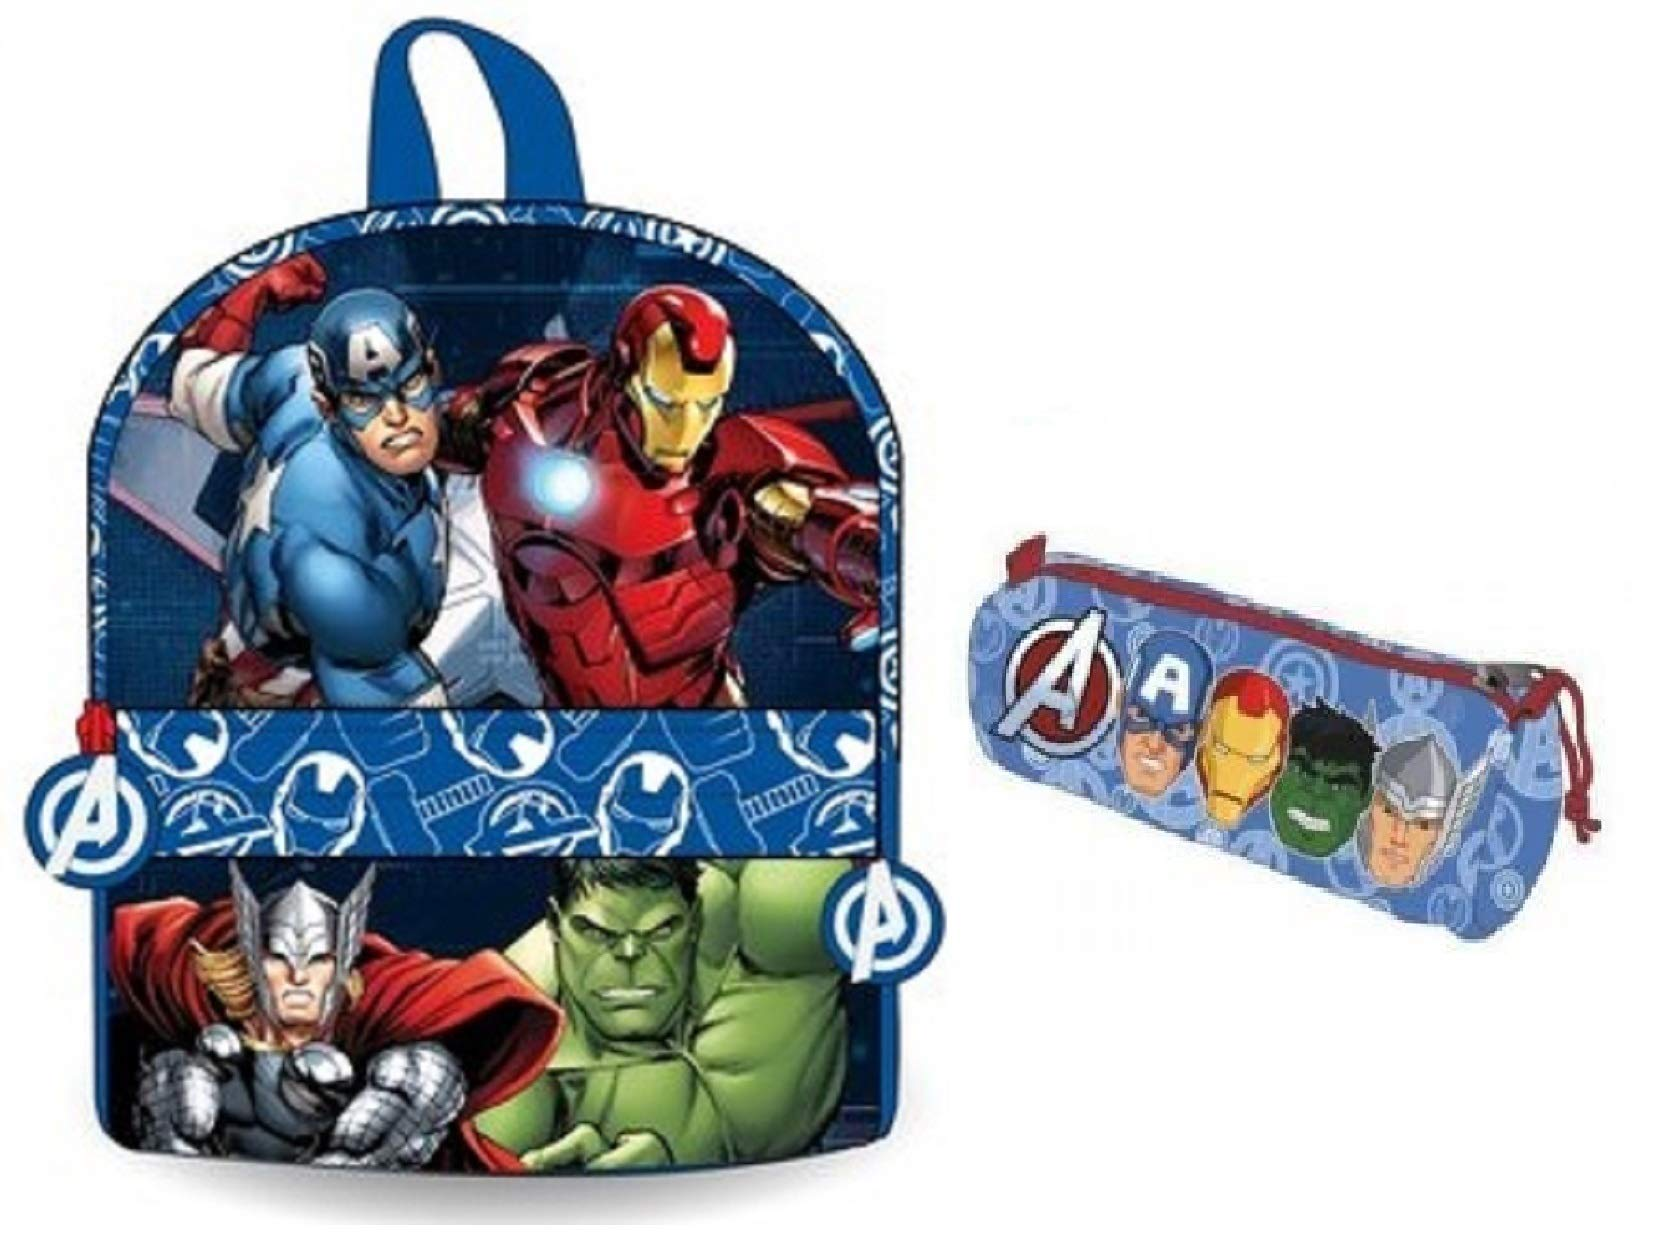 Avengers mochila infantil – estuche Avengers